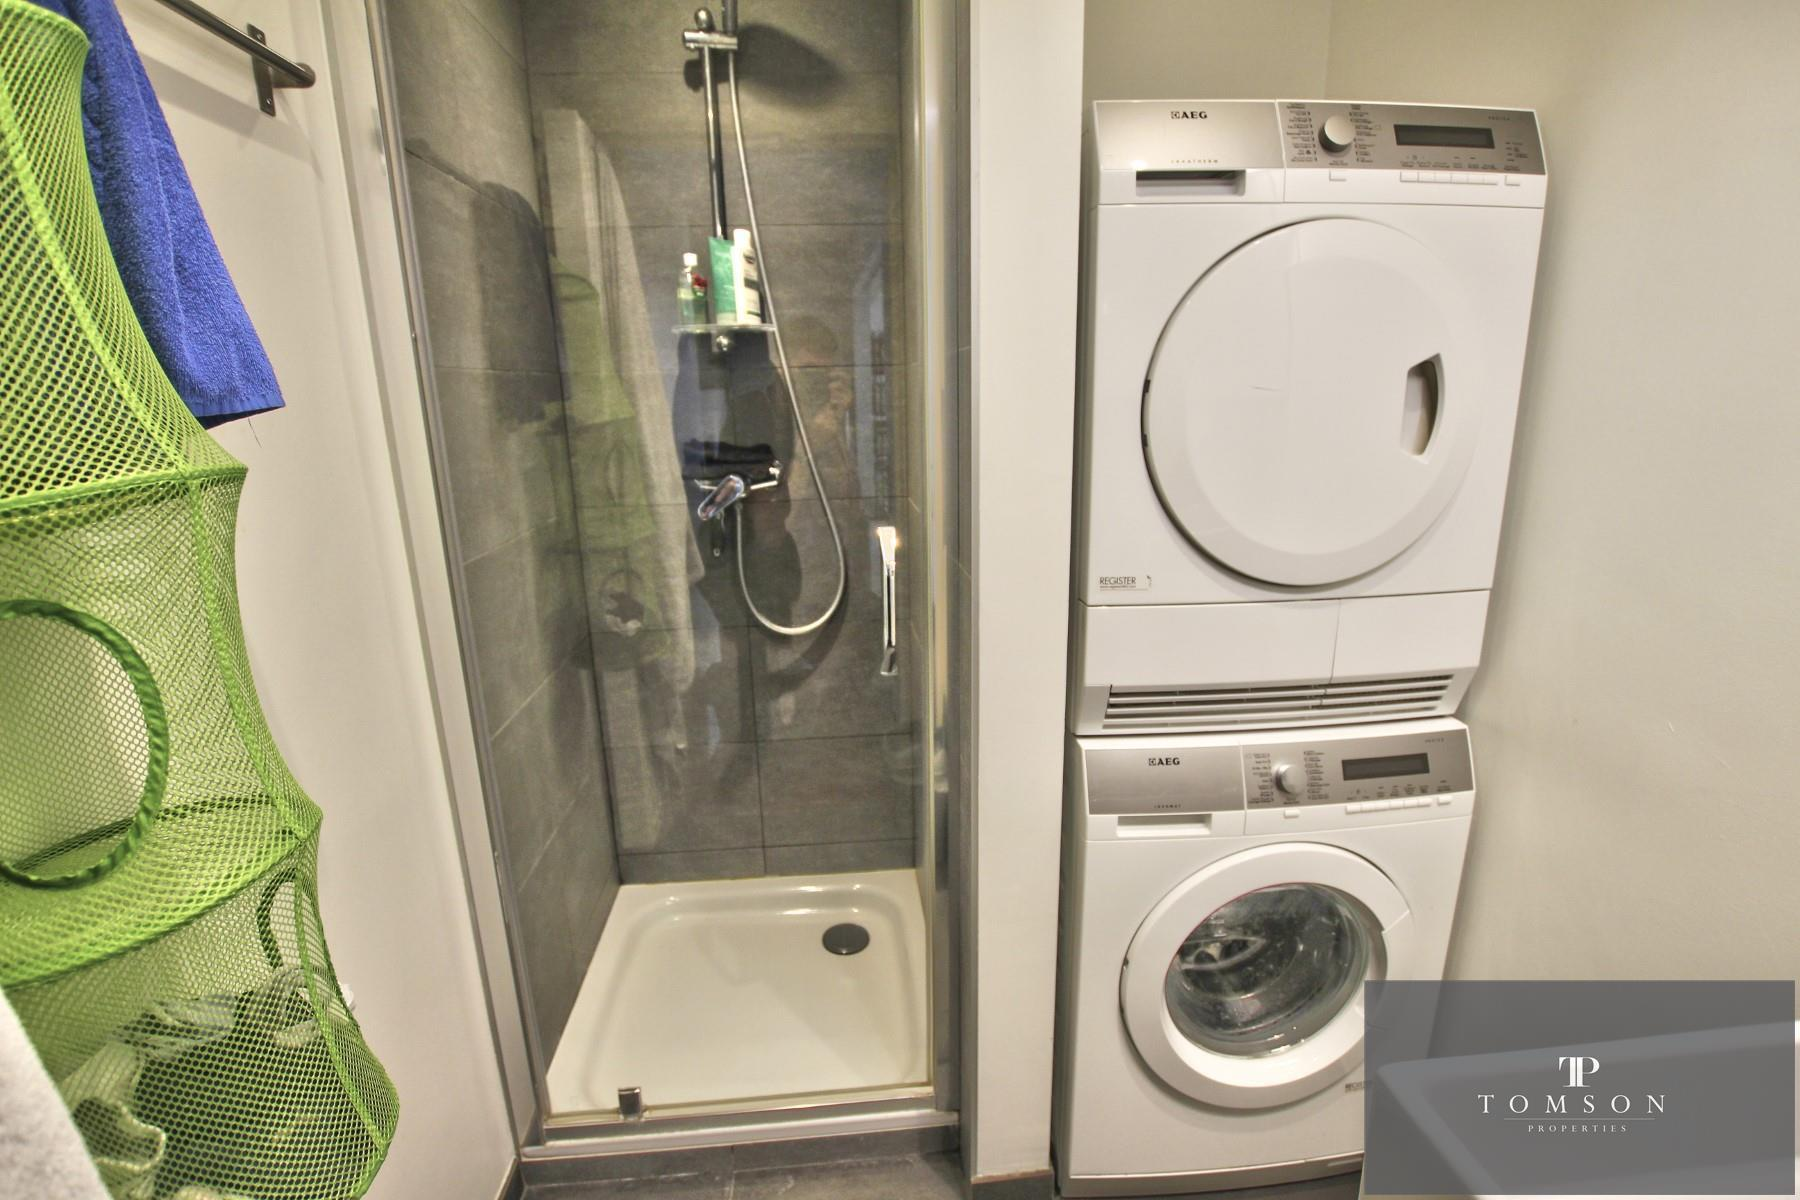 Appartement exceptionnel - Woluwe-Saint-Pierre - #4324789-10